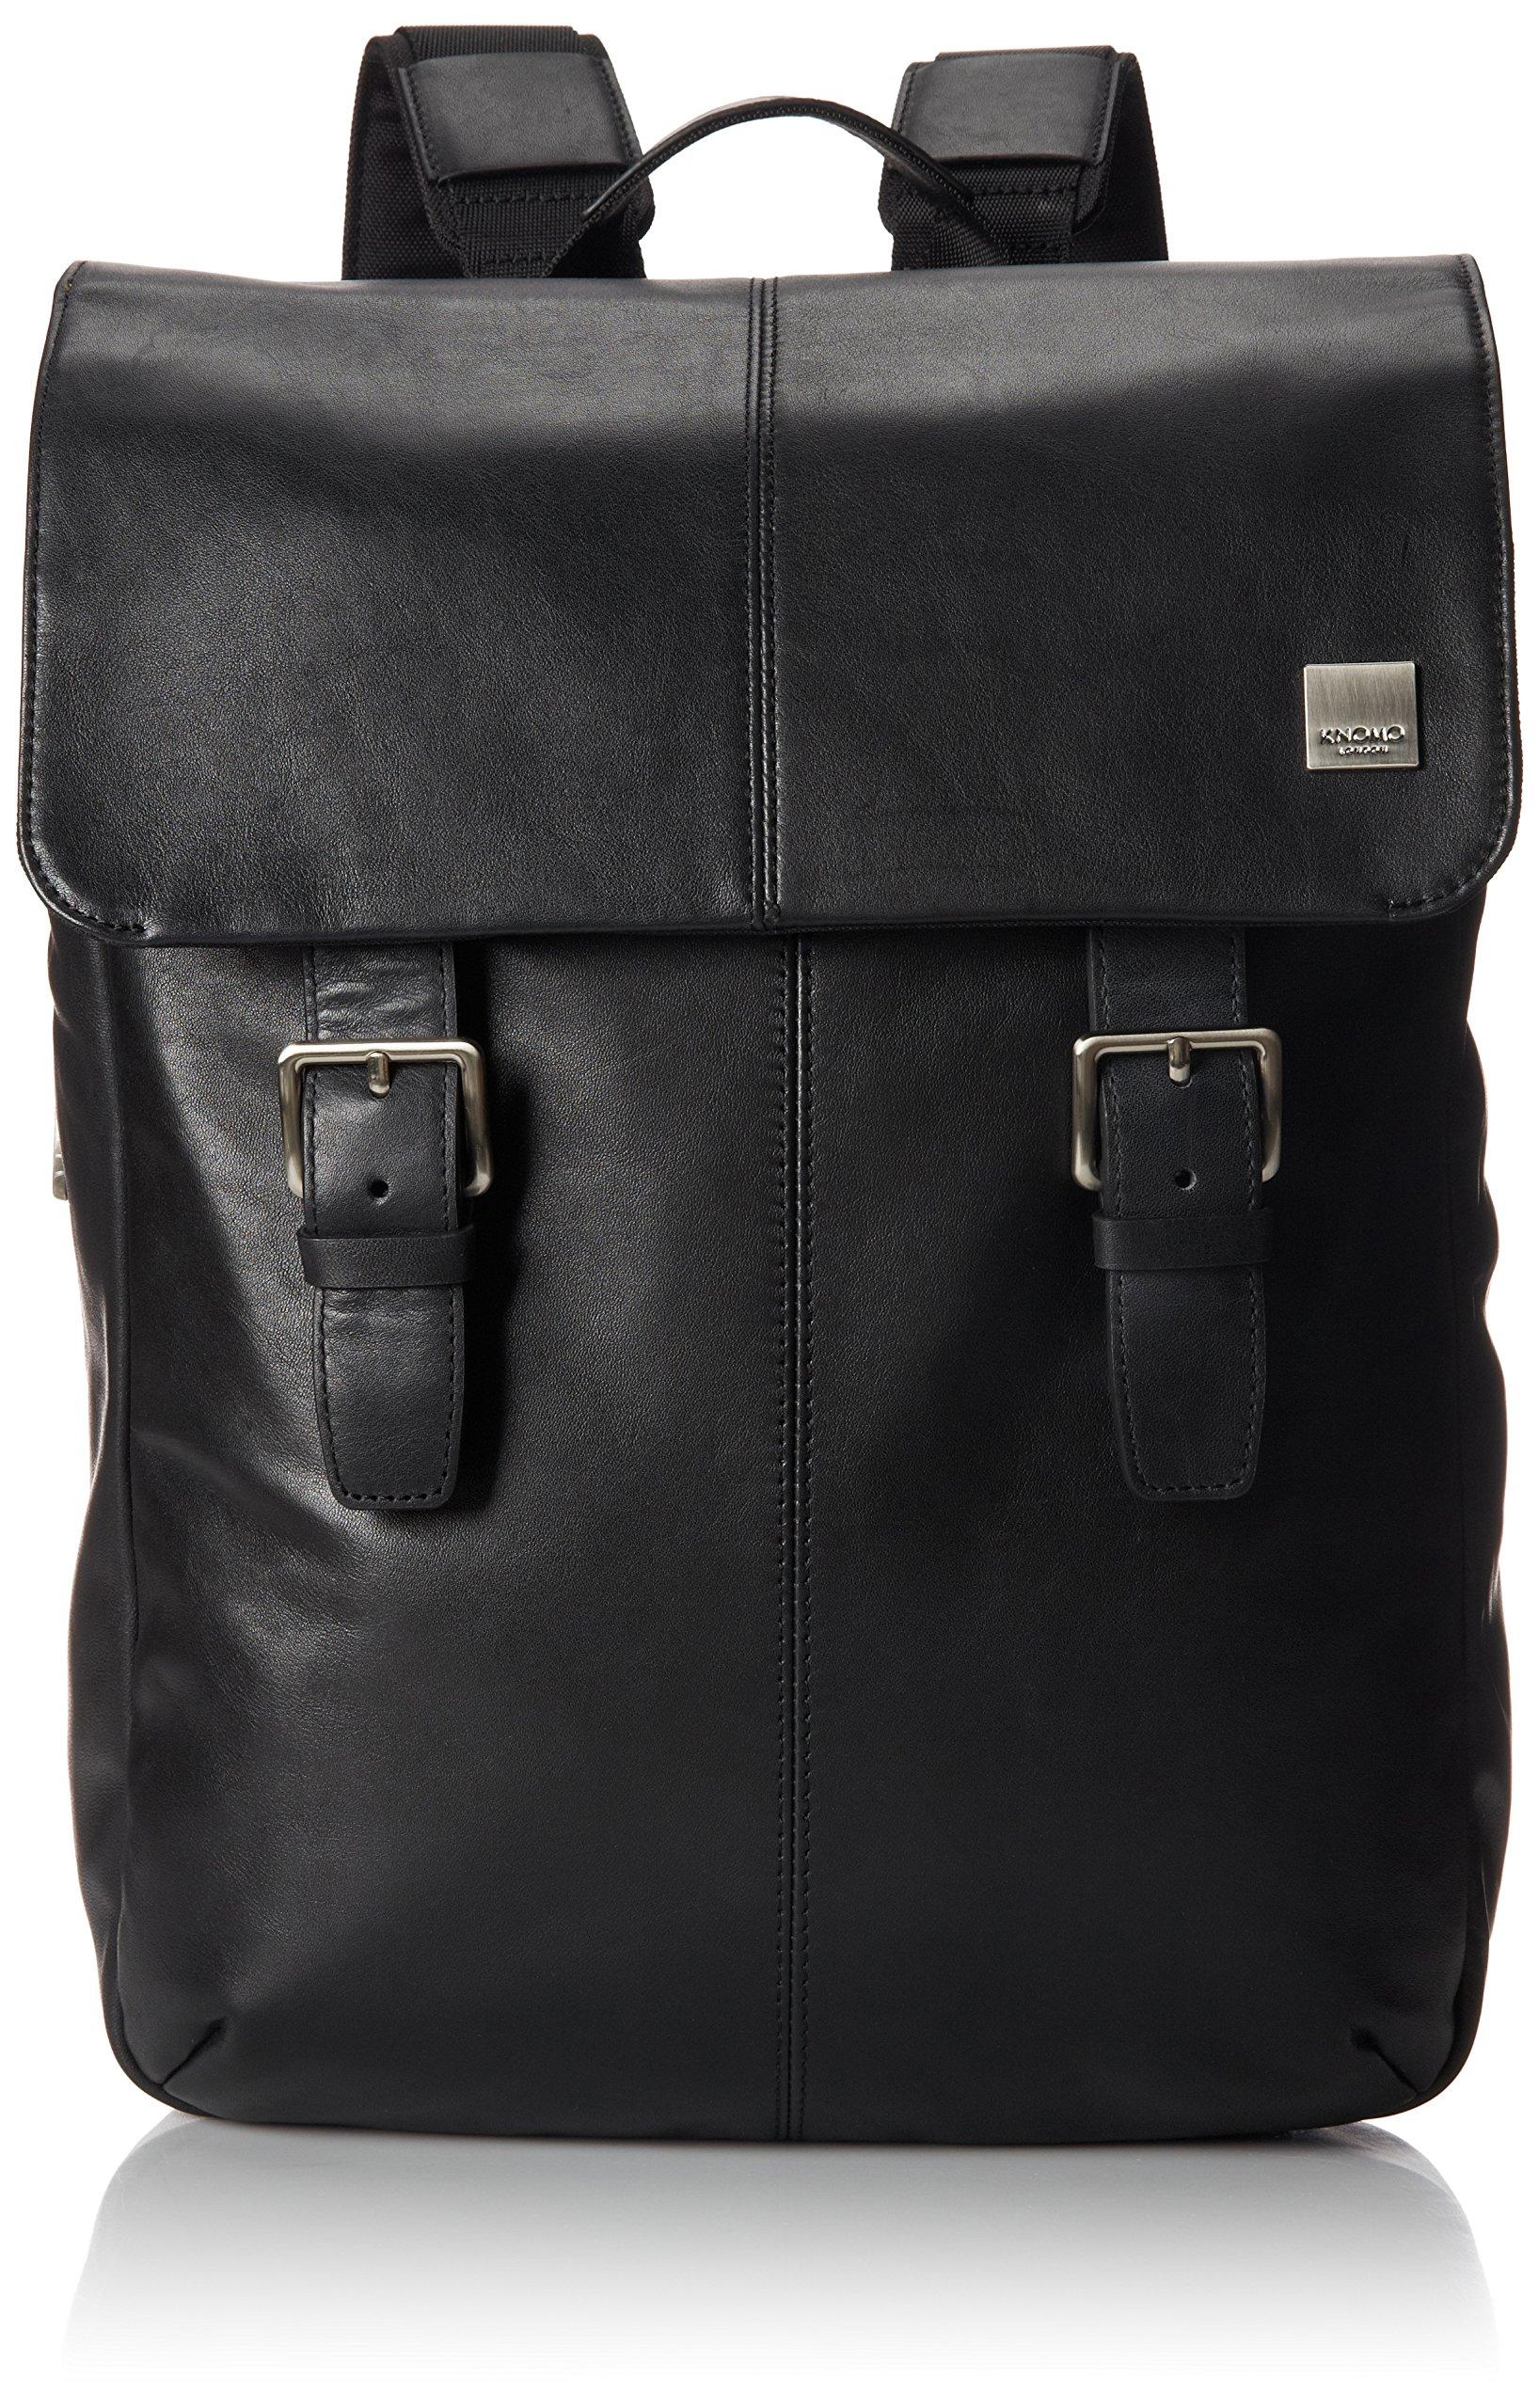 Knomo Luggage Hudson Business Backpack 11.8 X 15.7 X 3.5, Black, One Size